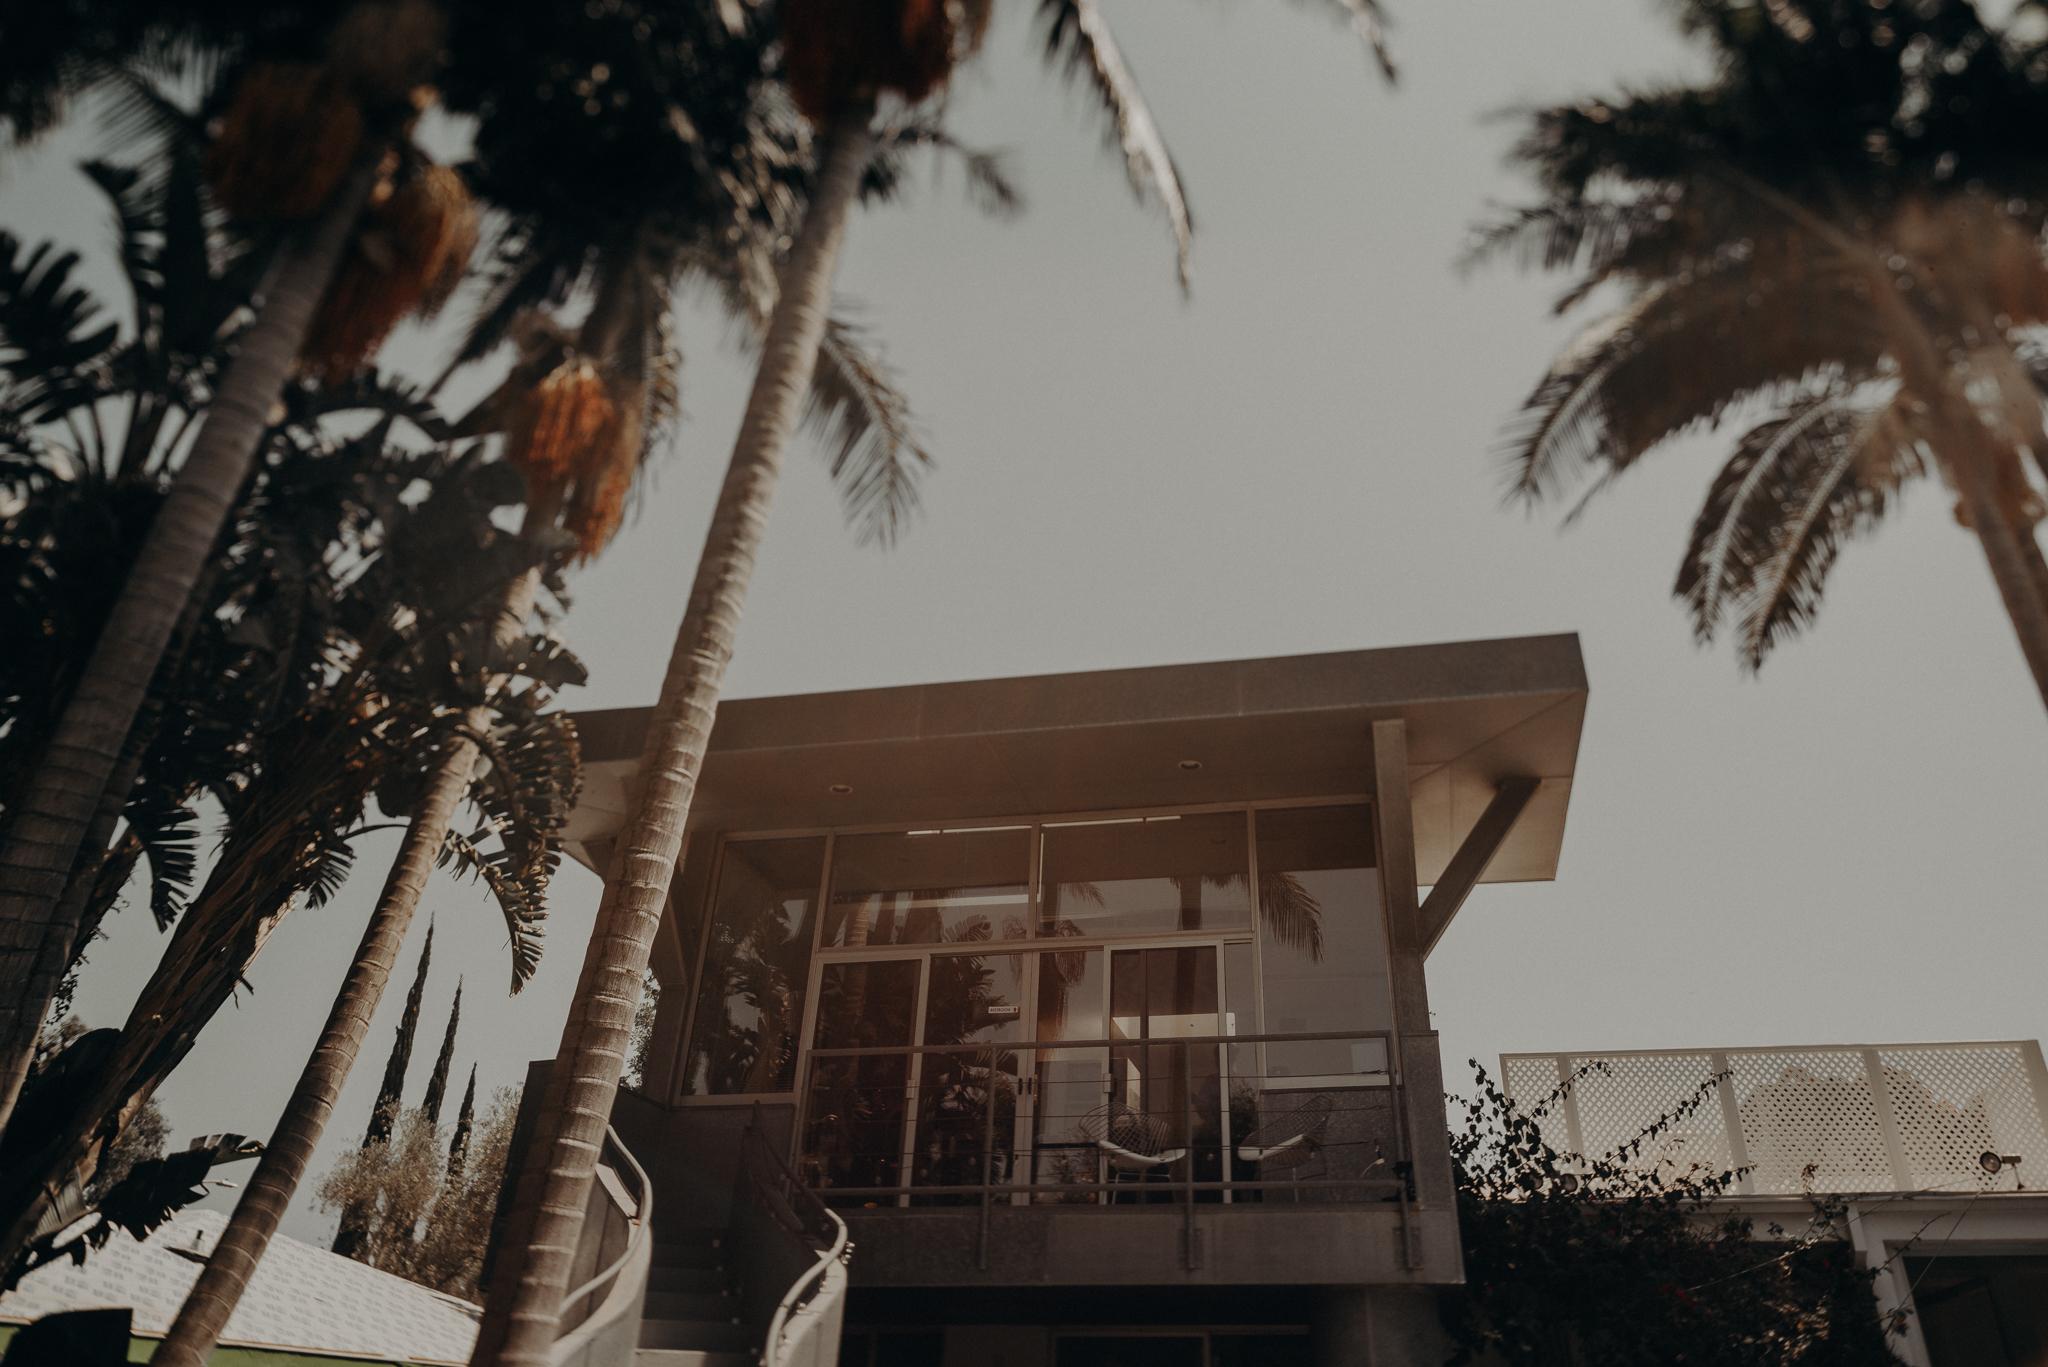 Isaiah + Taylor Photography - Private Estate Backyard Wedding - Beverly Hills - Los Angeles Wedding Photographer - 03.jpg